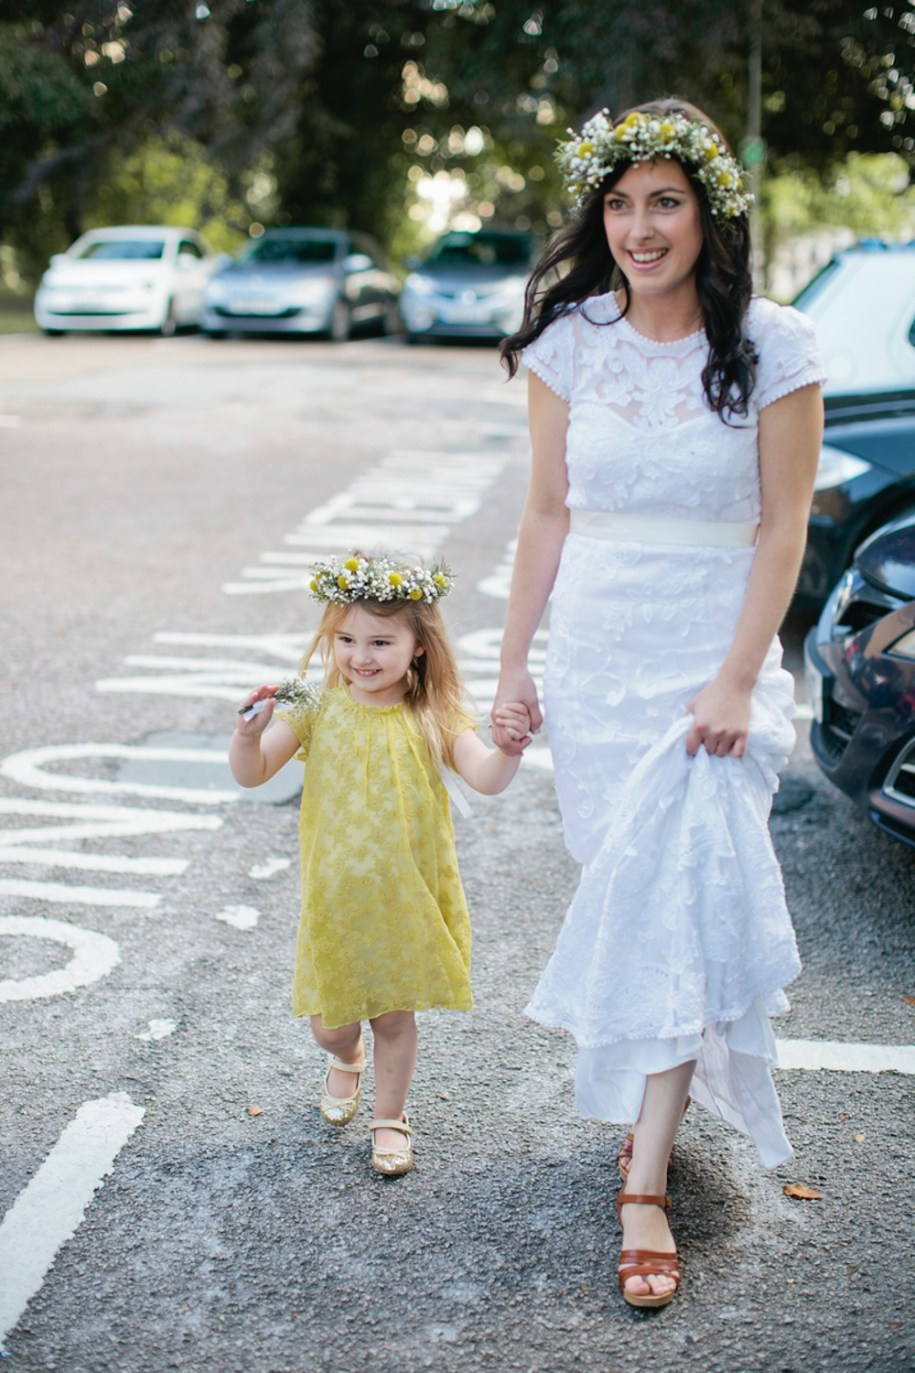 Bride and flower girl walking by Hawarden festival wedding photographer